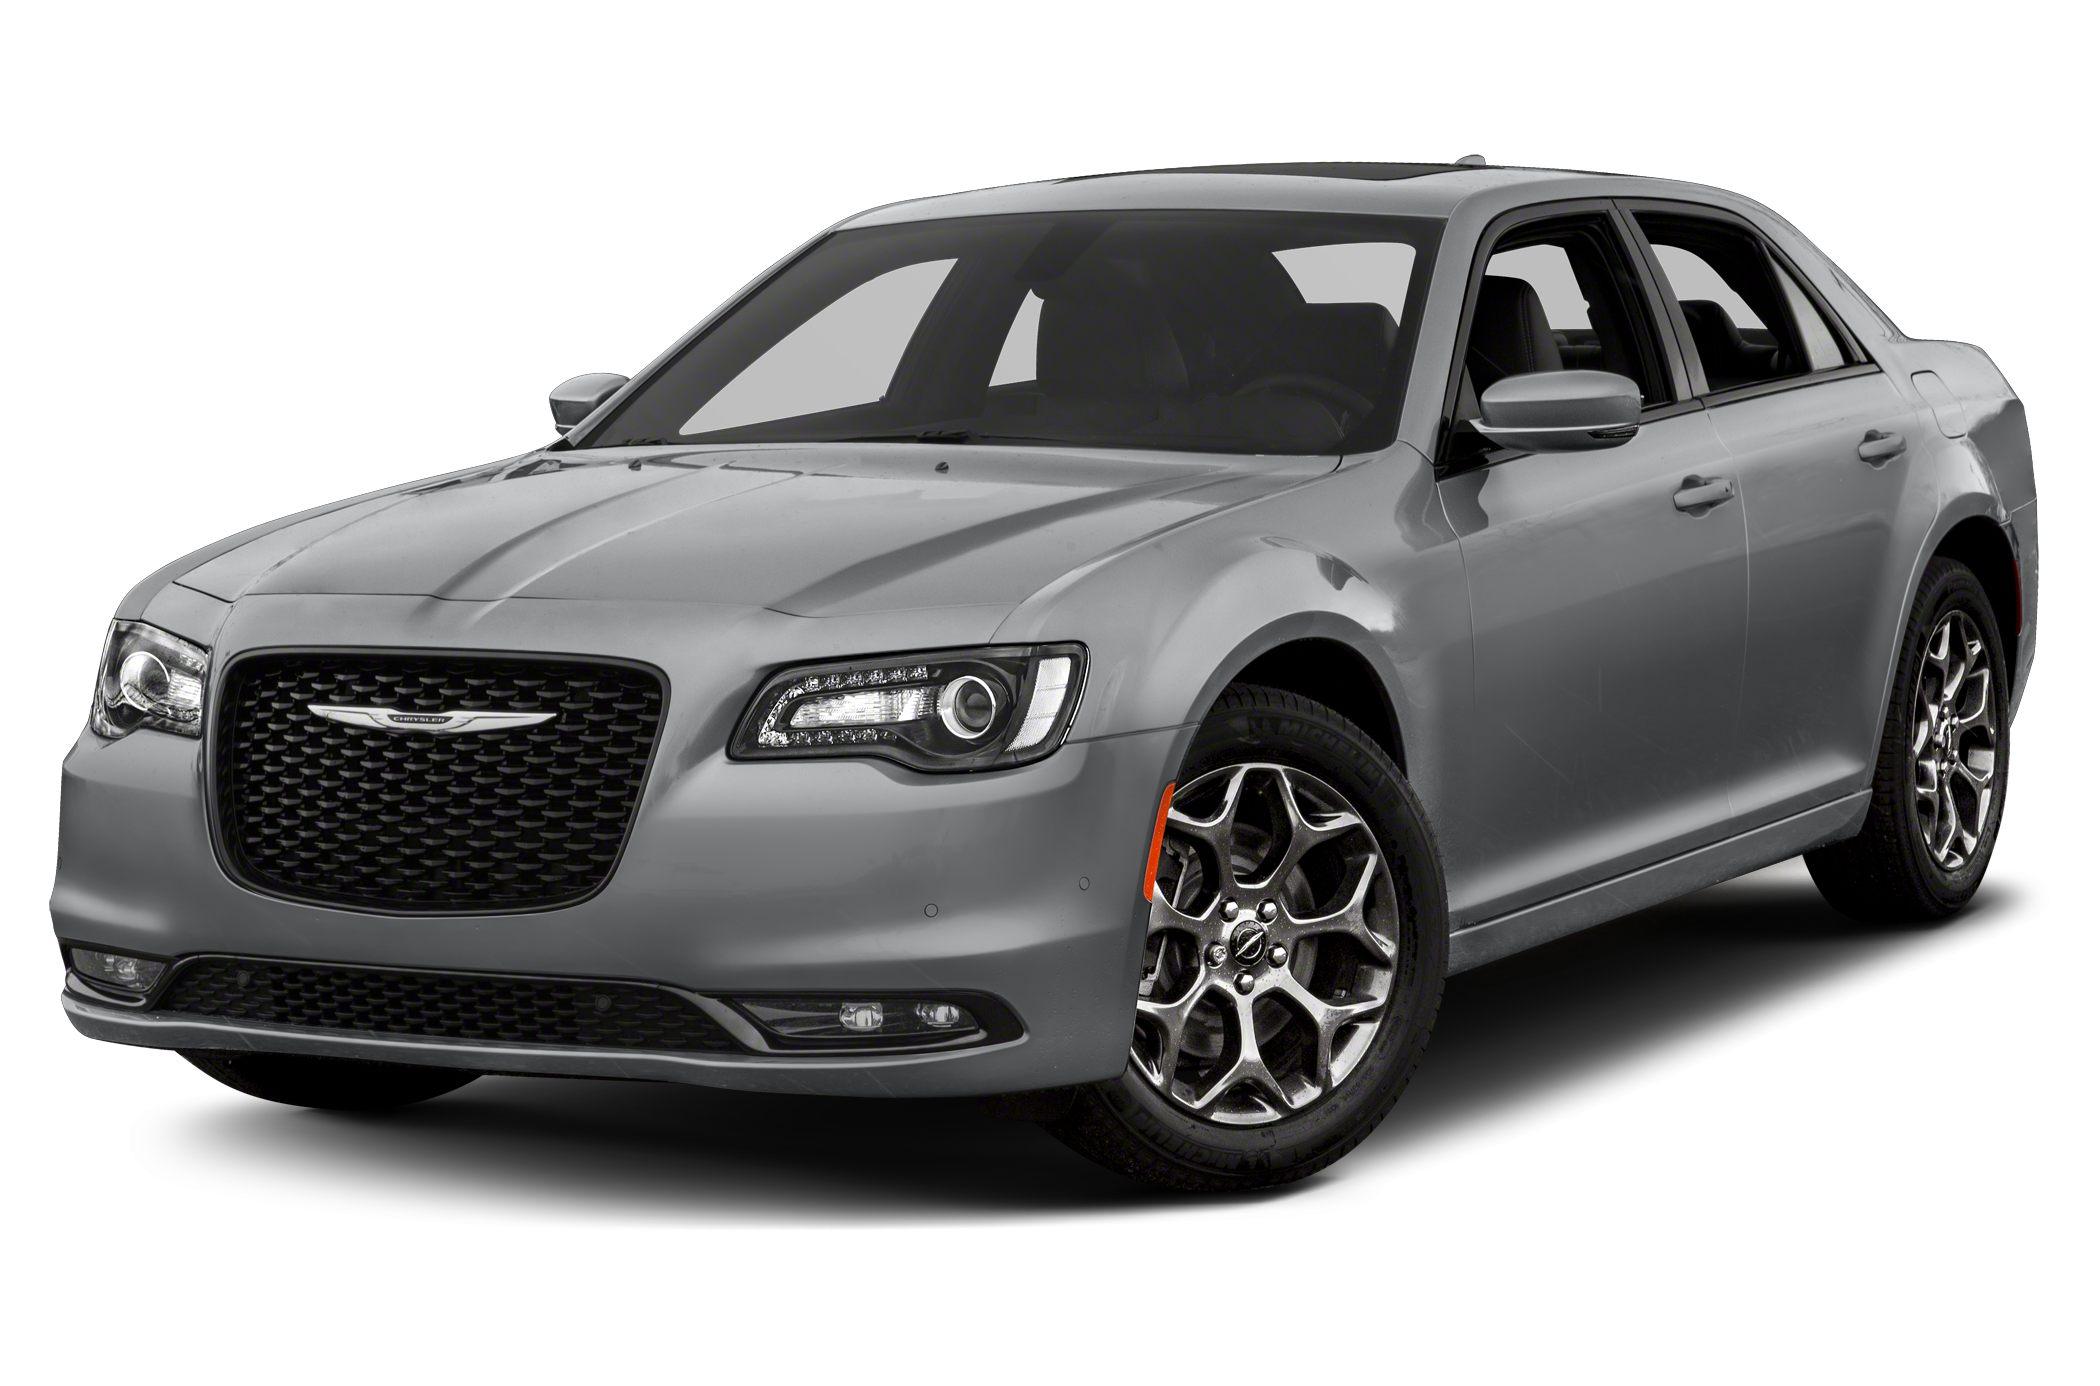 2016 Chrysler 300 S Price includes 500 - Southwest 2016 Bonus Cash SWCGA 1000 - 2016MY USAA M